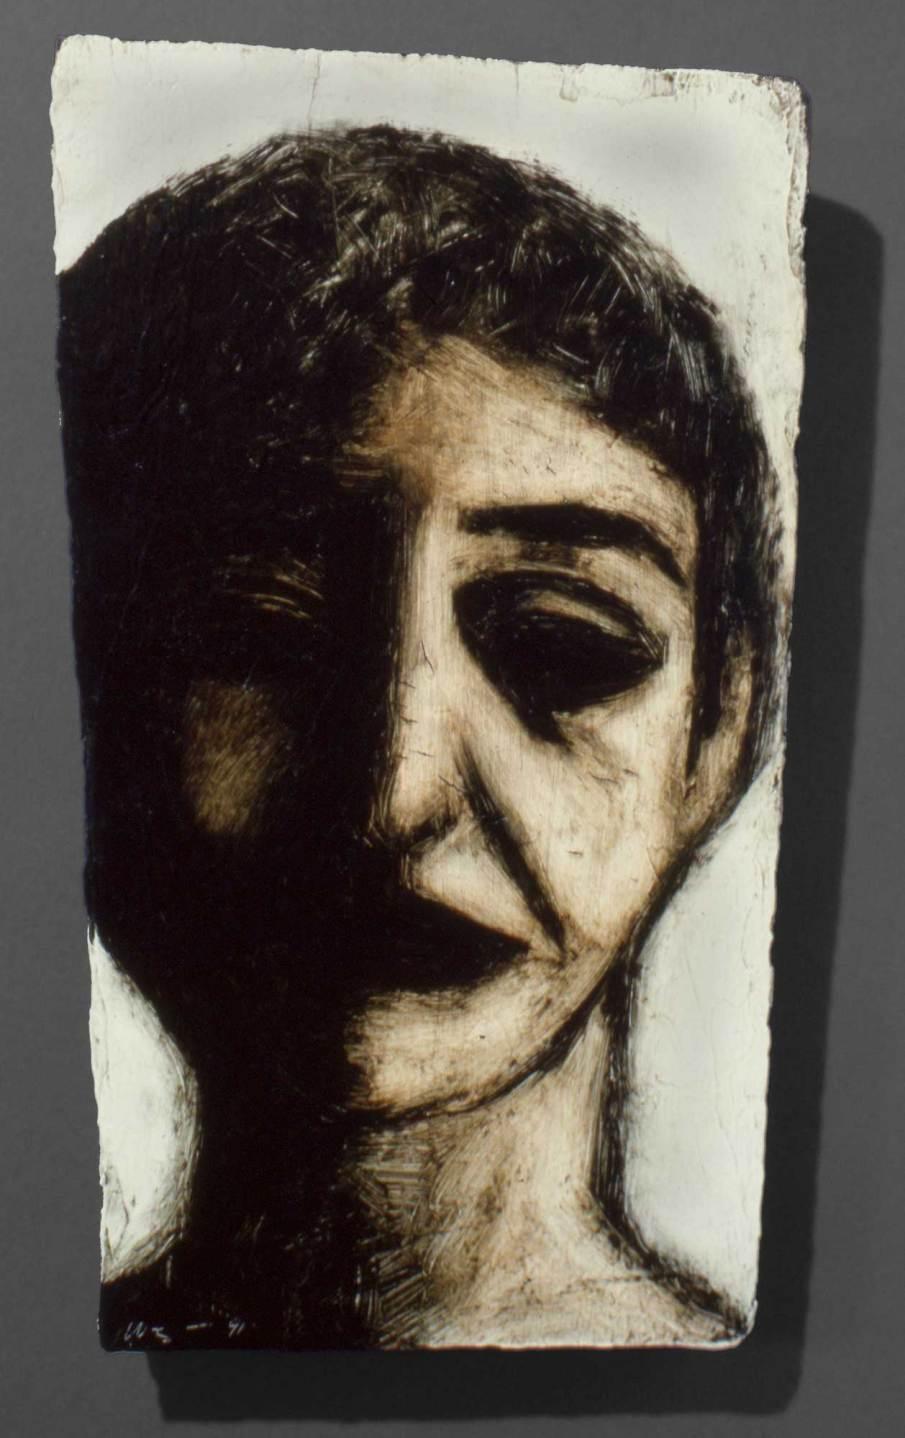 Face, oil on wood, 10 X 6, 1991